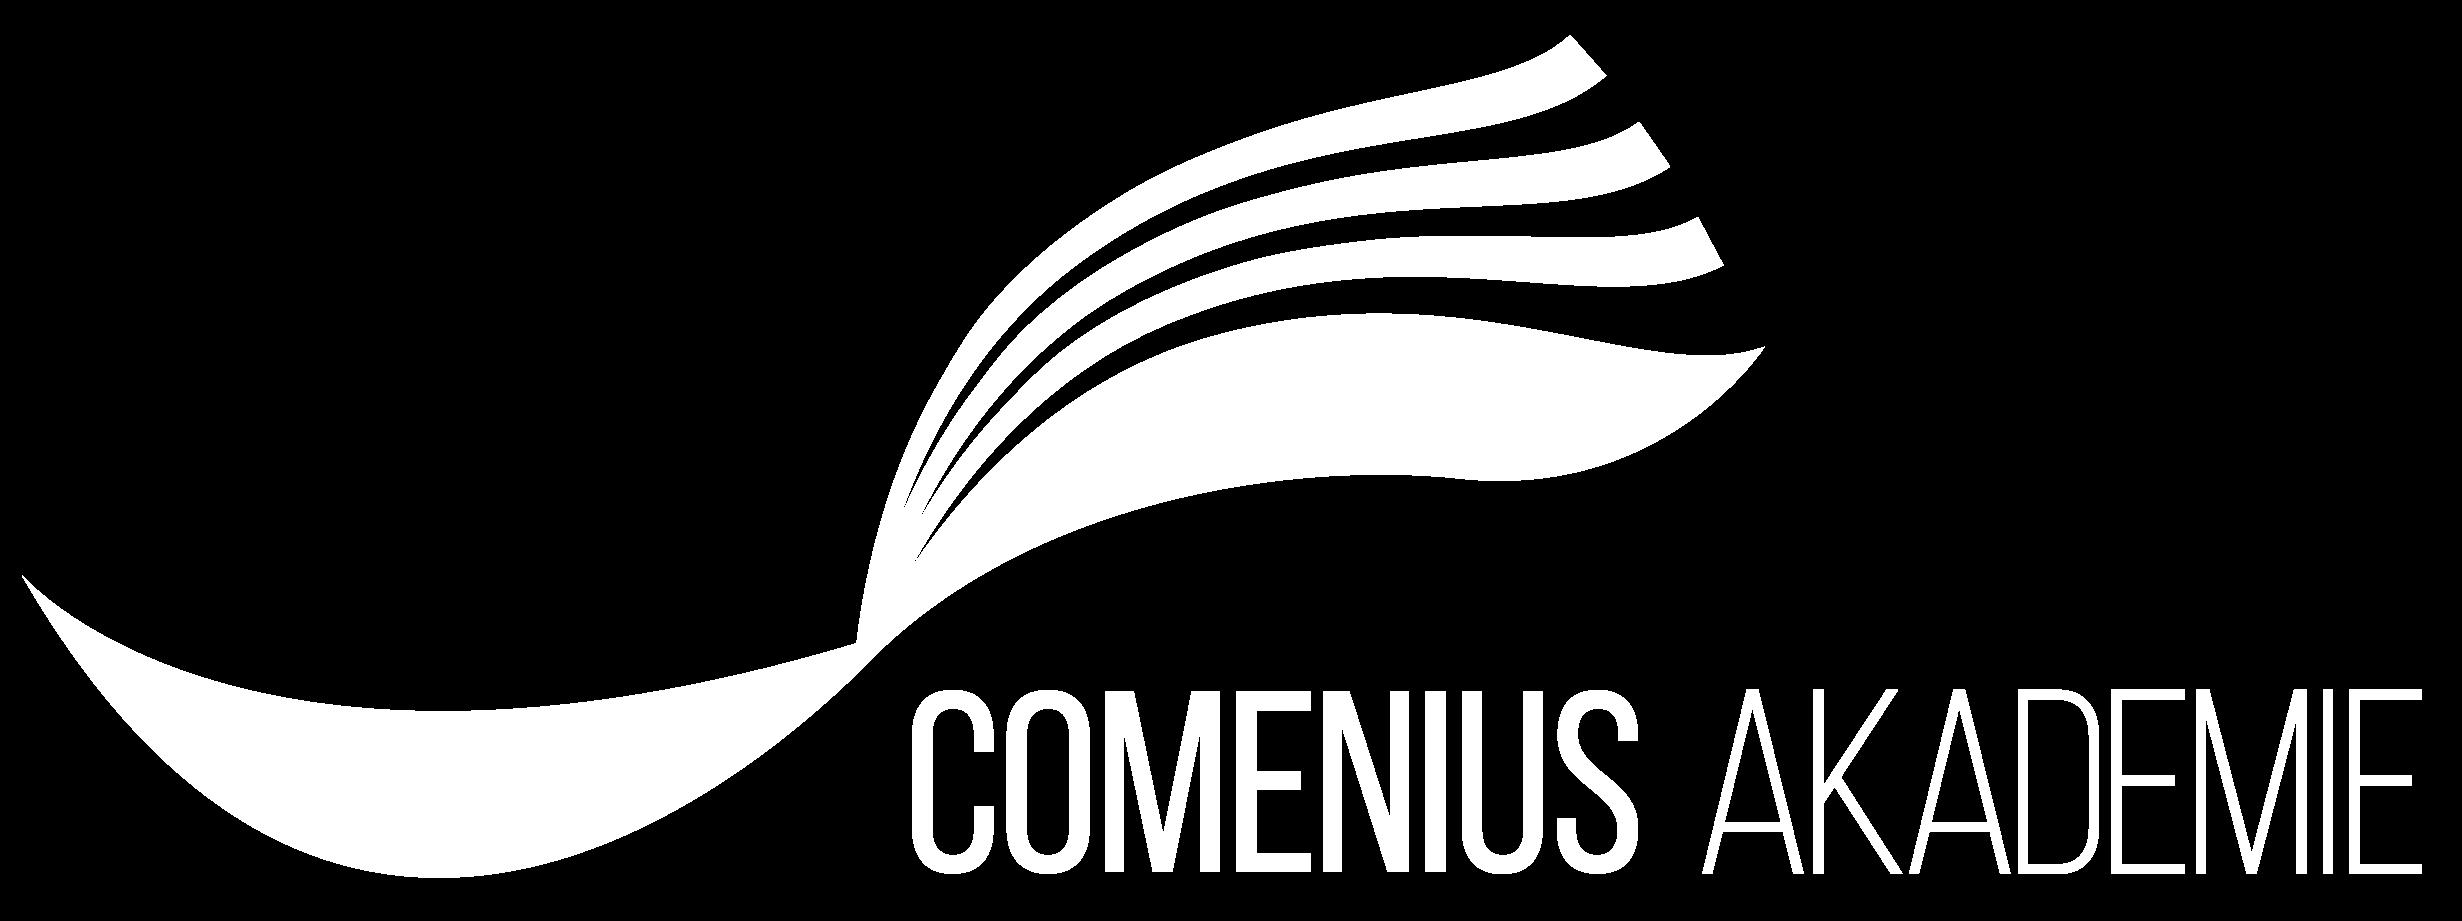 Comenius Akademie logo